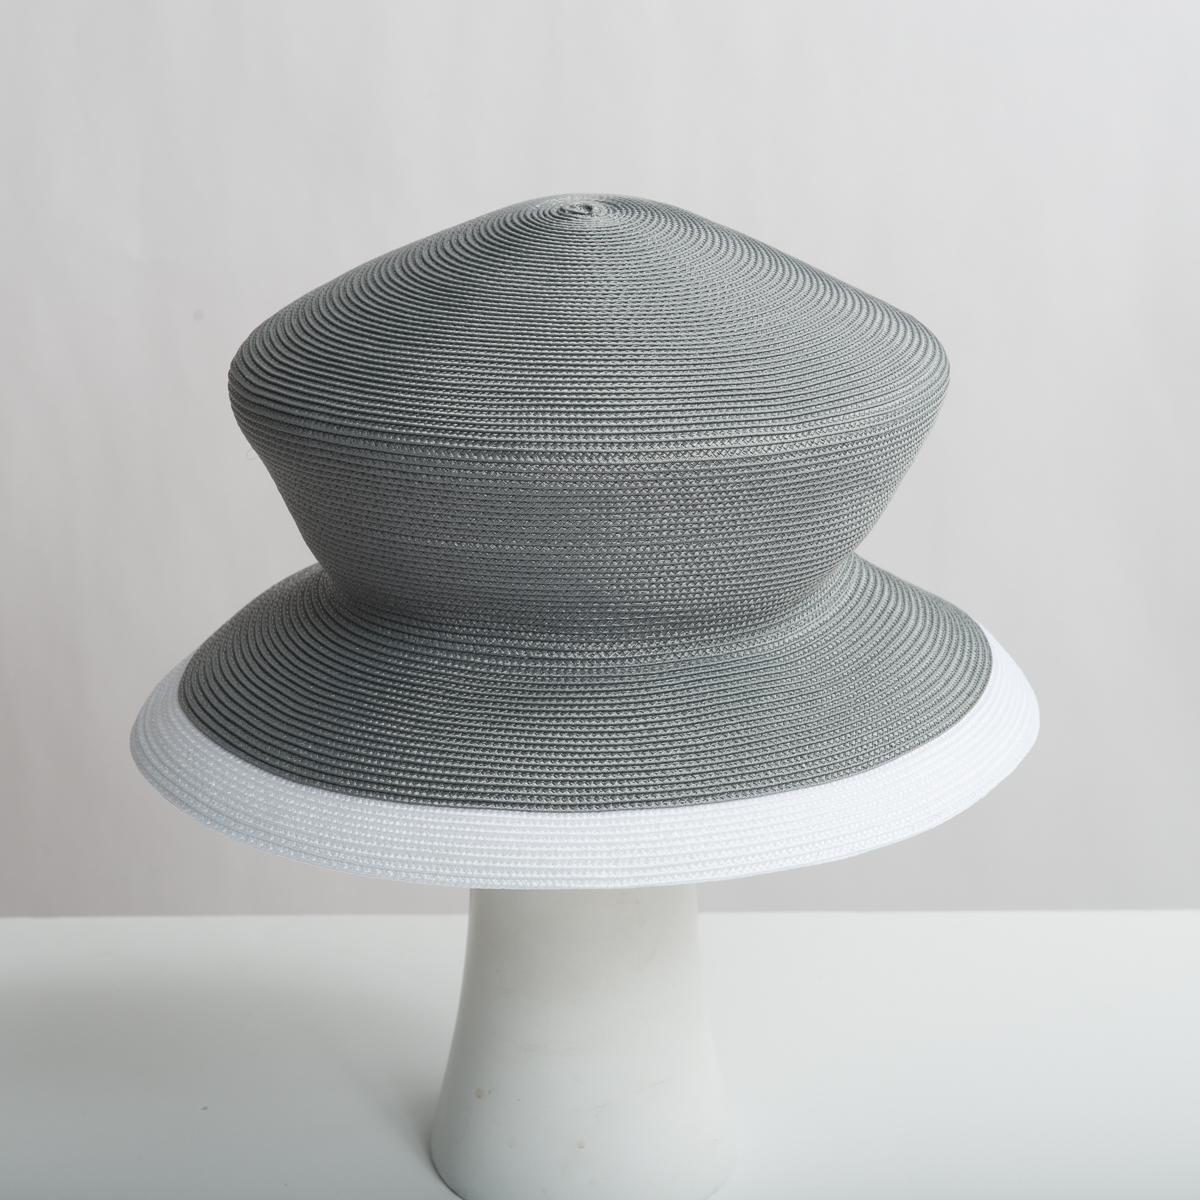 2e80405651ed3d Grey - White Dull Polypropylene Straw Medium Brim Plain Hats-Y6026_88-04.06-  Sun Yorkos | Zoria